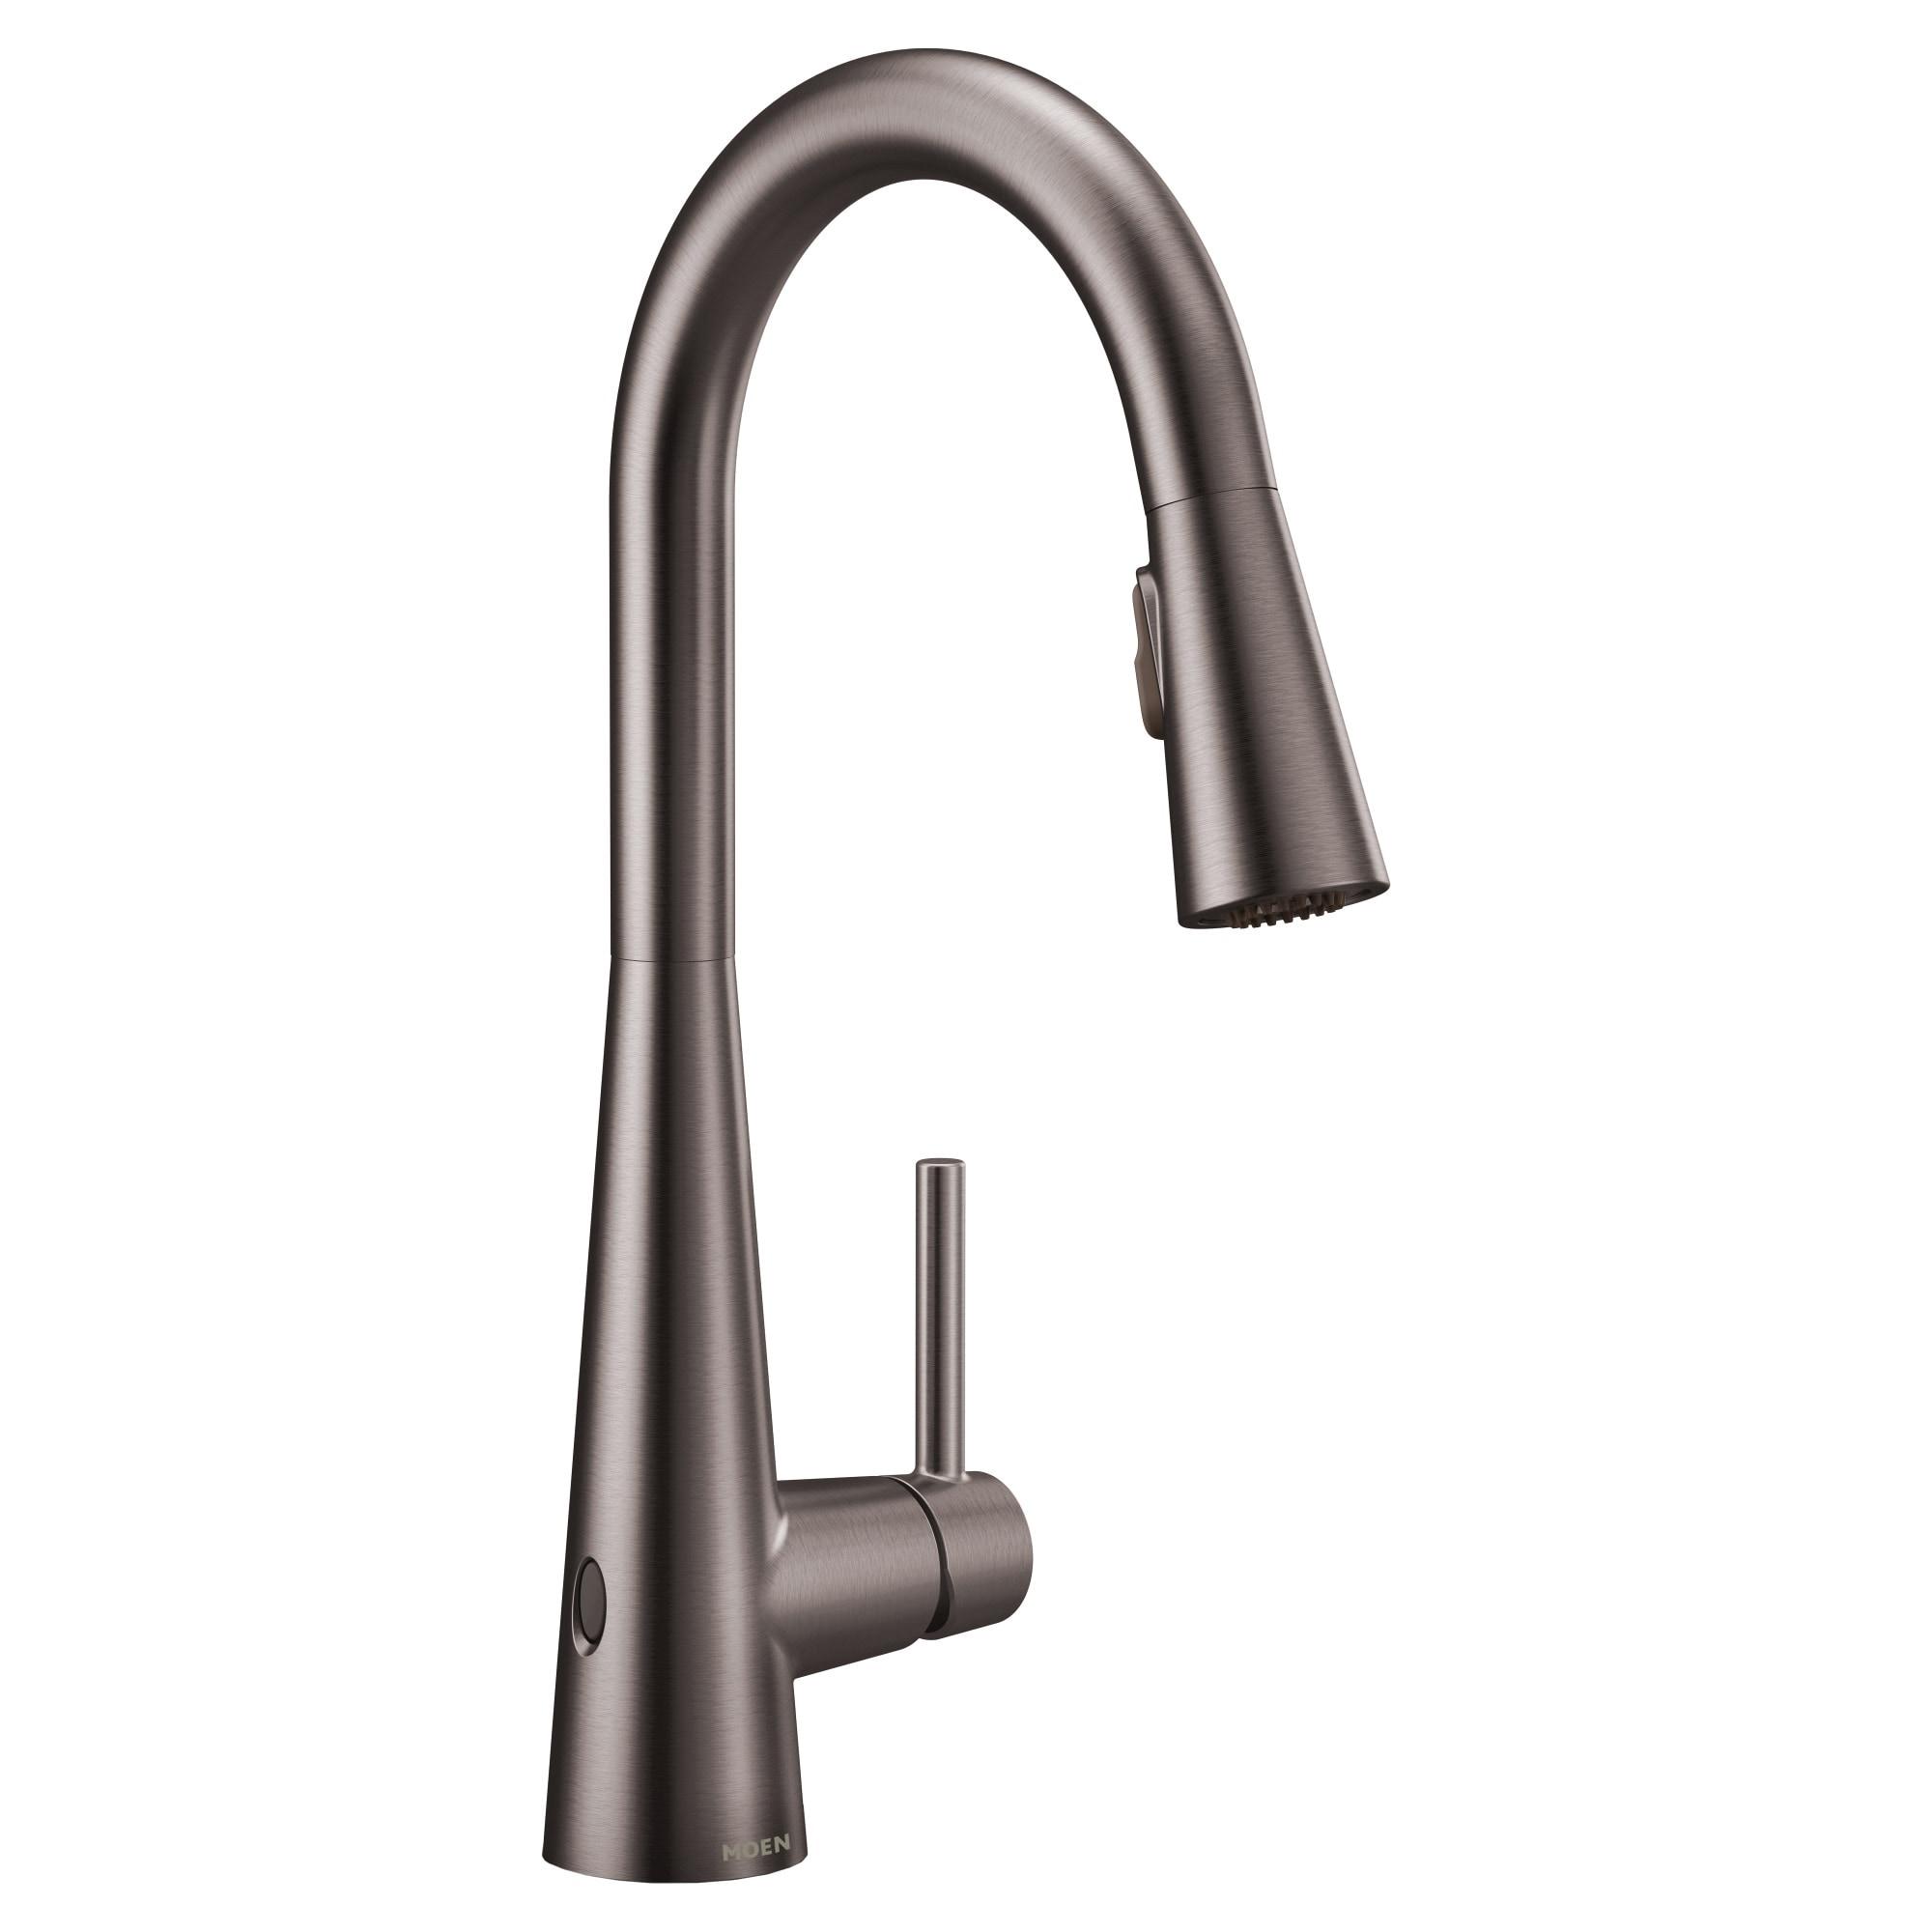 Moen 7864EW Sleek 1.5 GPM Single Hole Pull Down Kitchen Faucet with Reflex,  MotionSense Wave, Duralast, Duralock, and Power